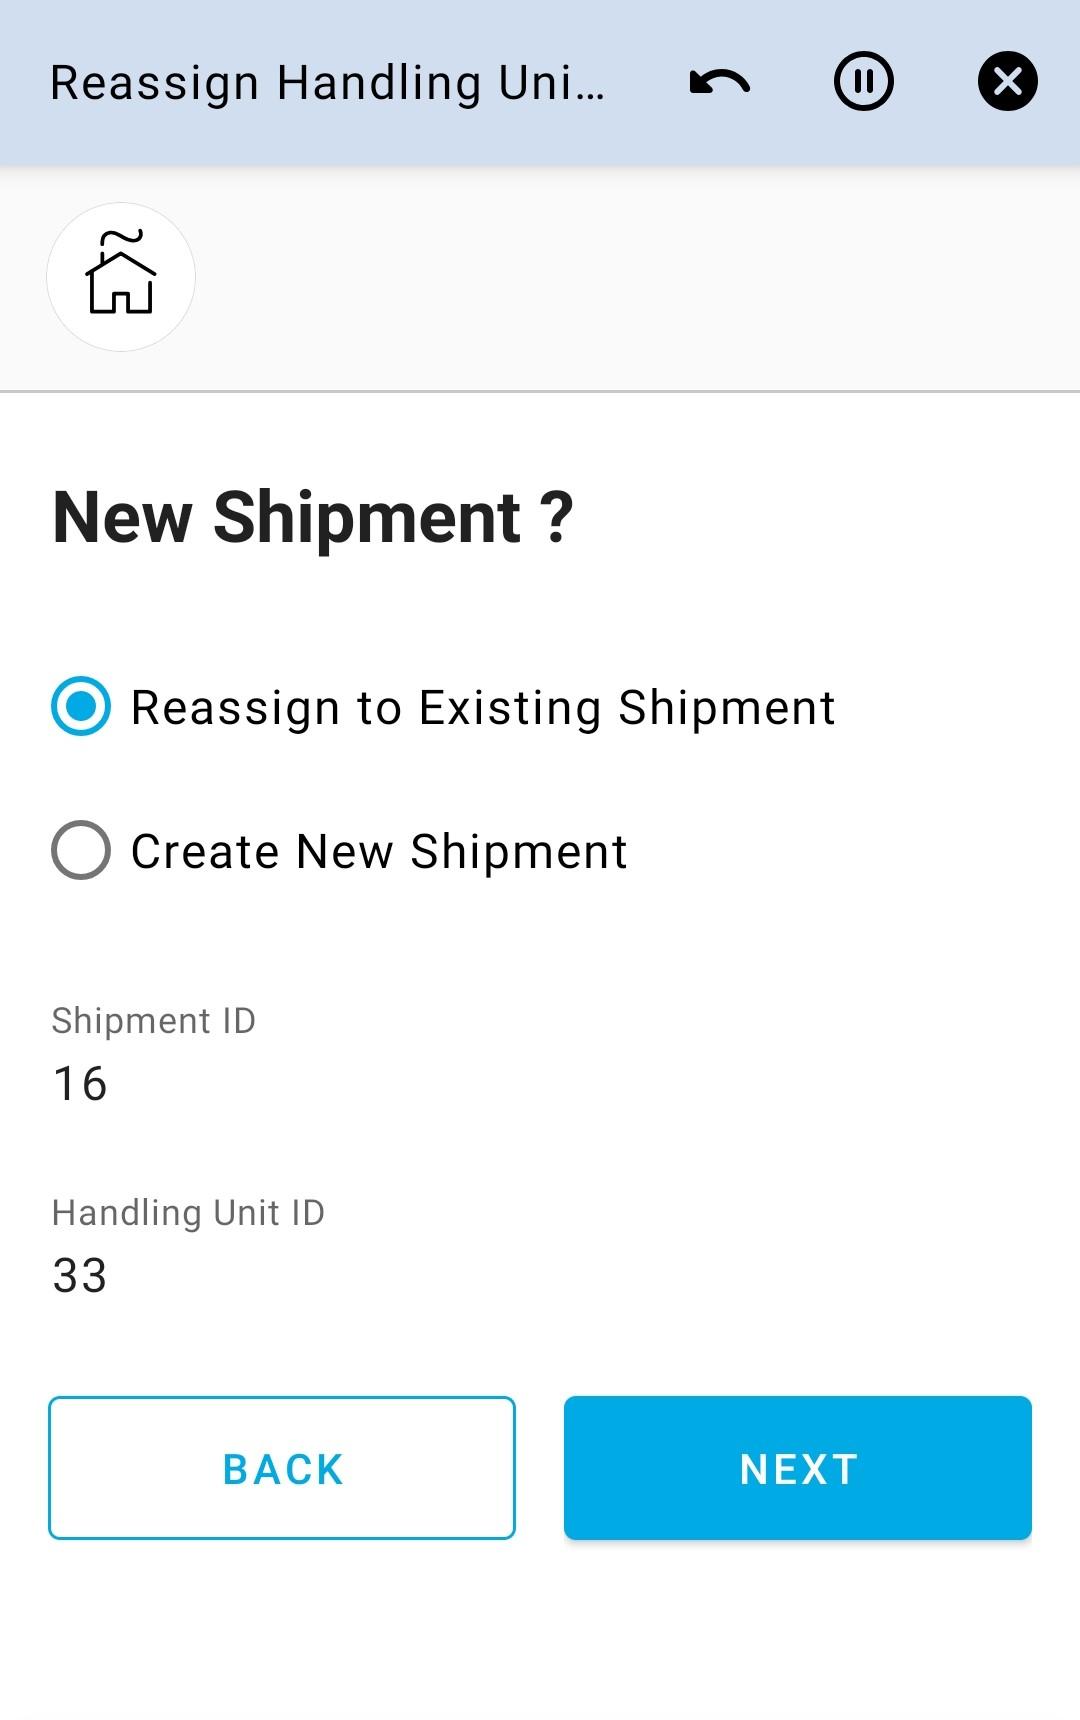 New Shipment